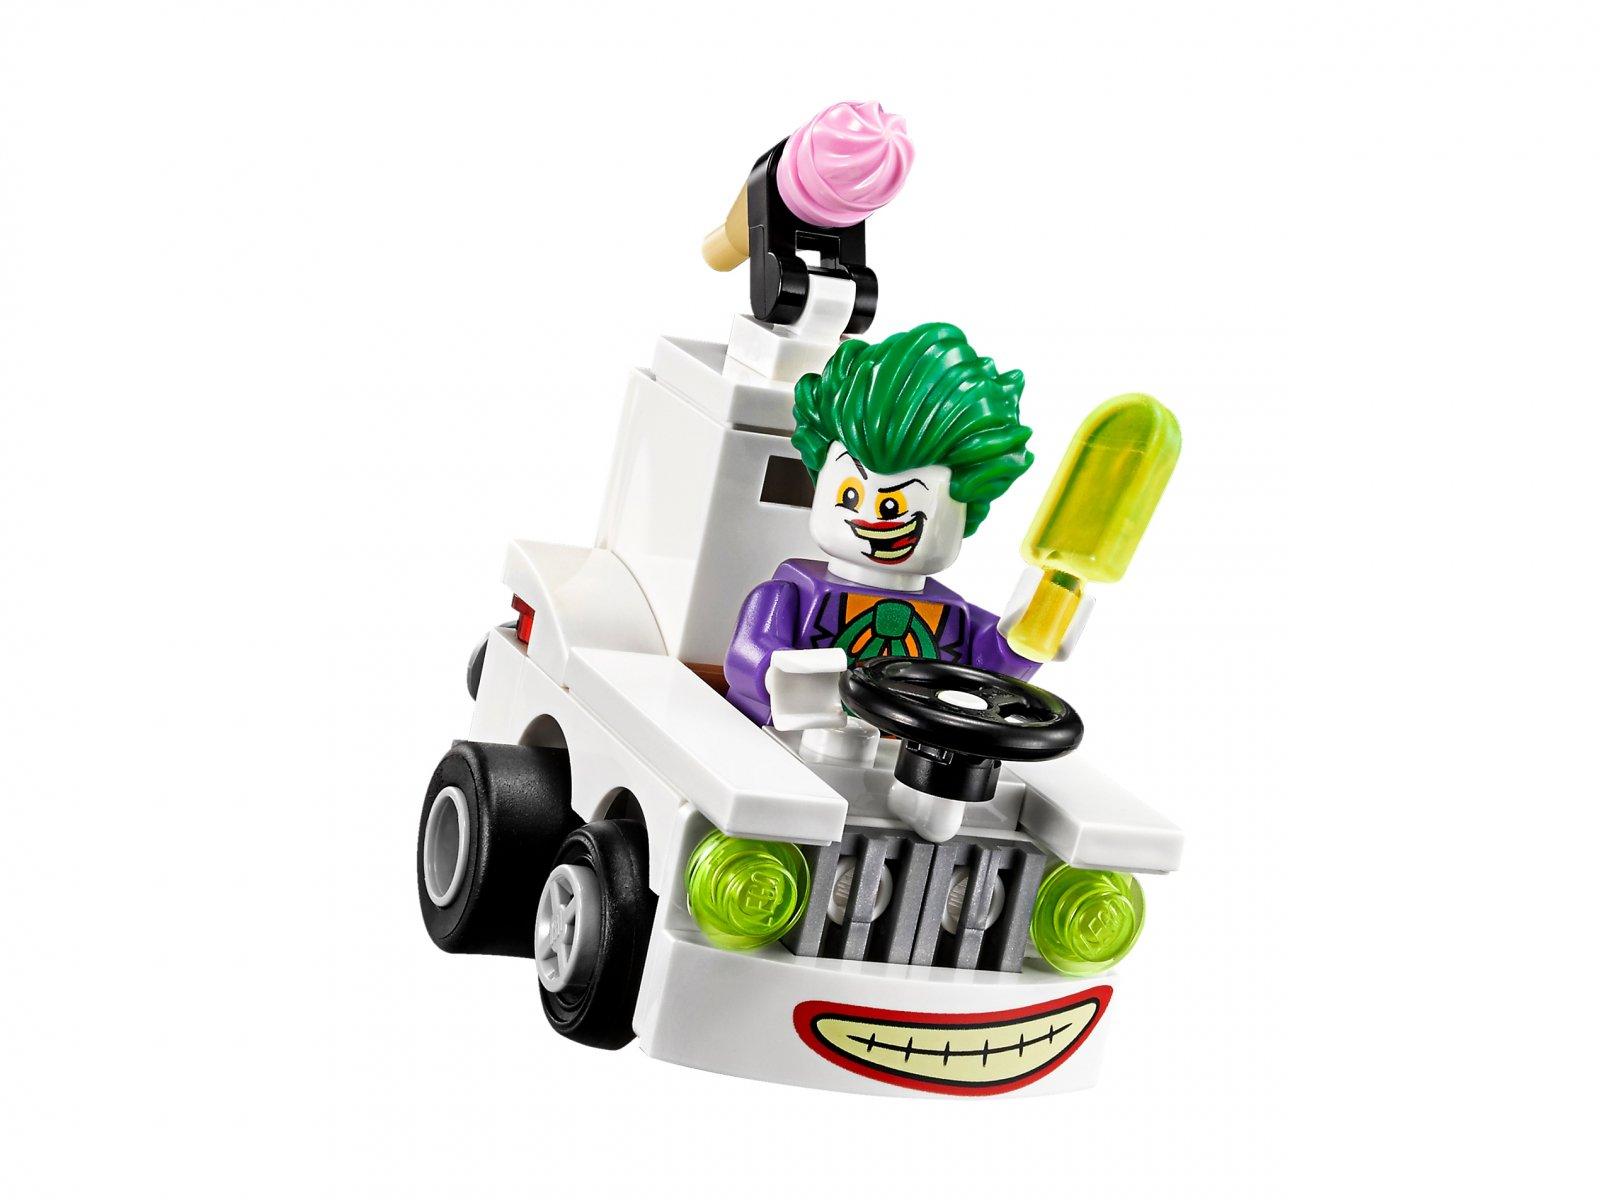 LEGO 76093 DC Comics™ Super Heroes Nightwing™ vs. The Joker™